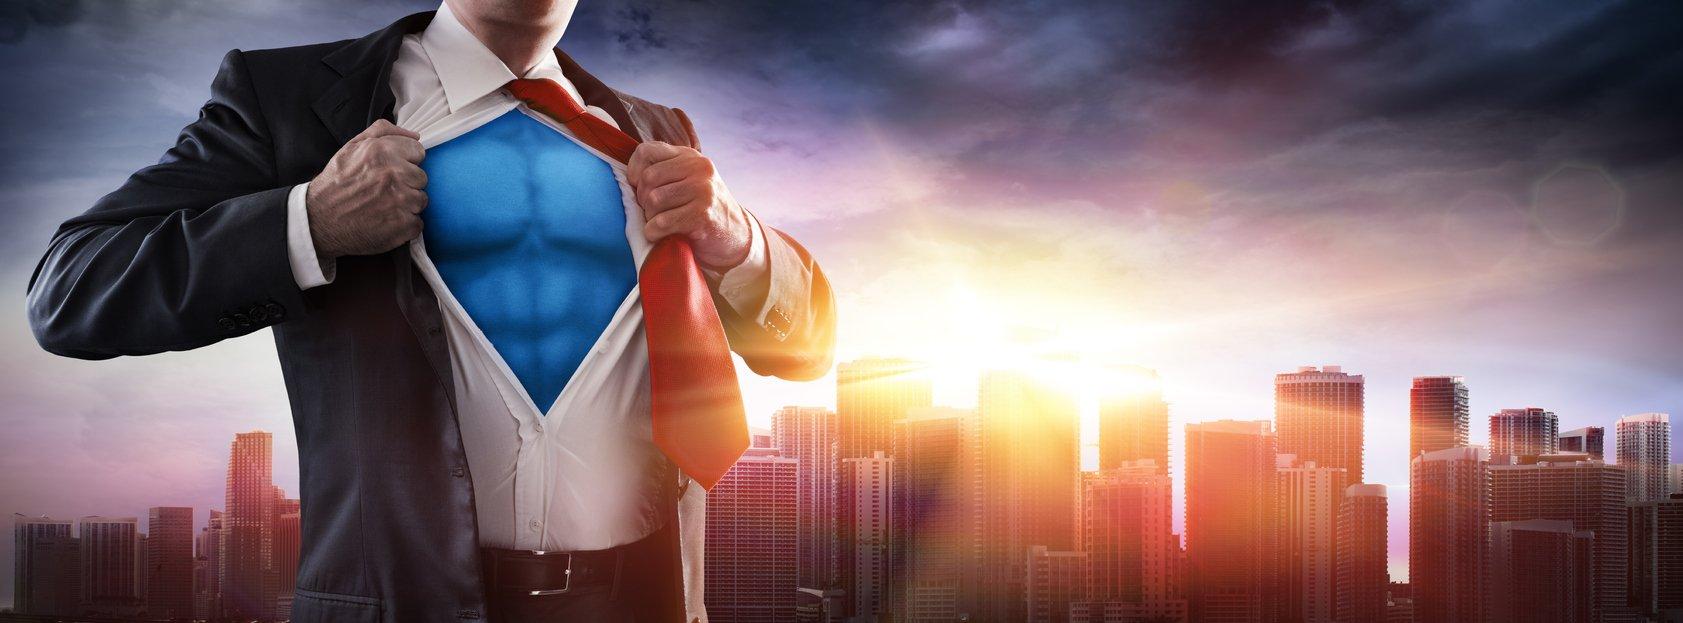 Business's-Superhero-518414242_1689x625